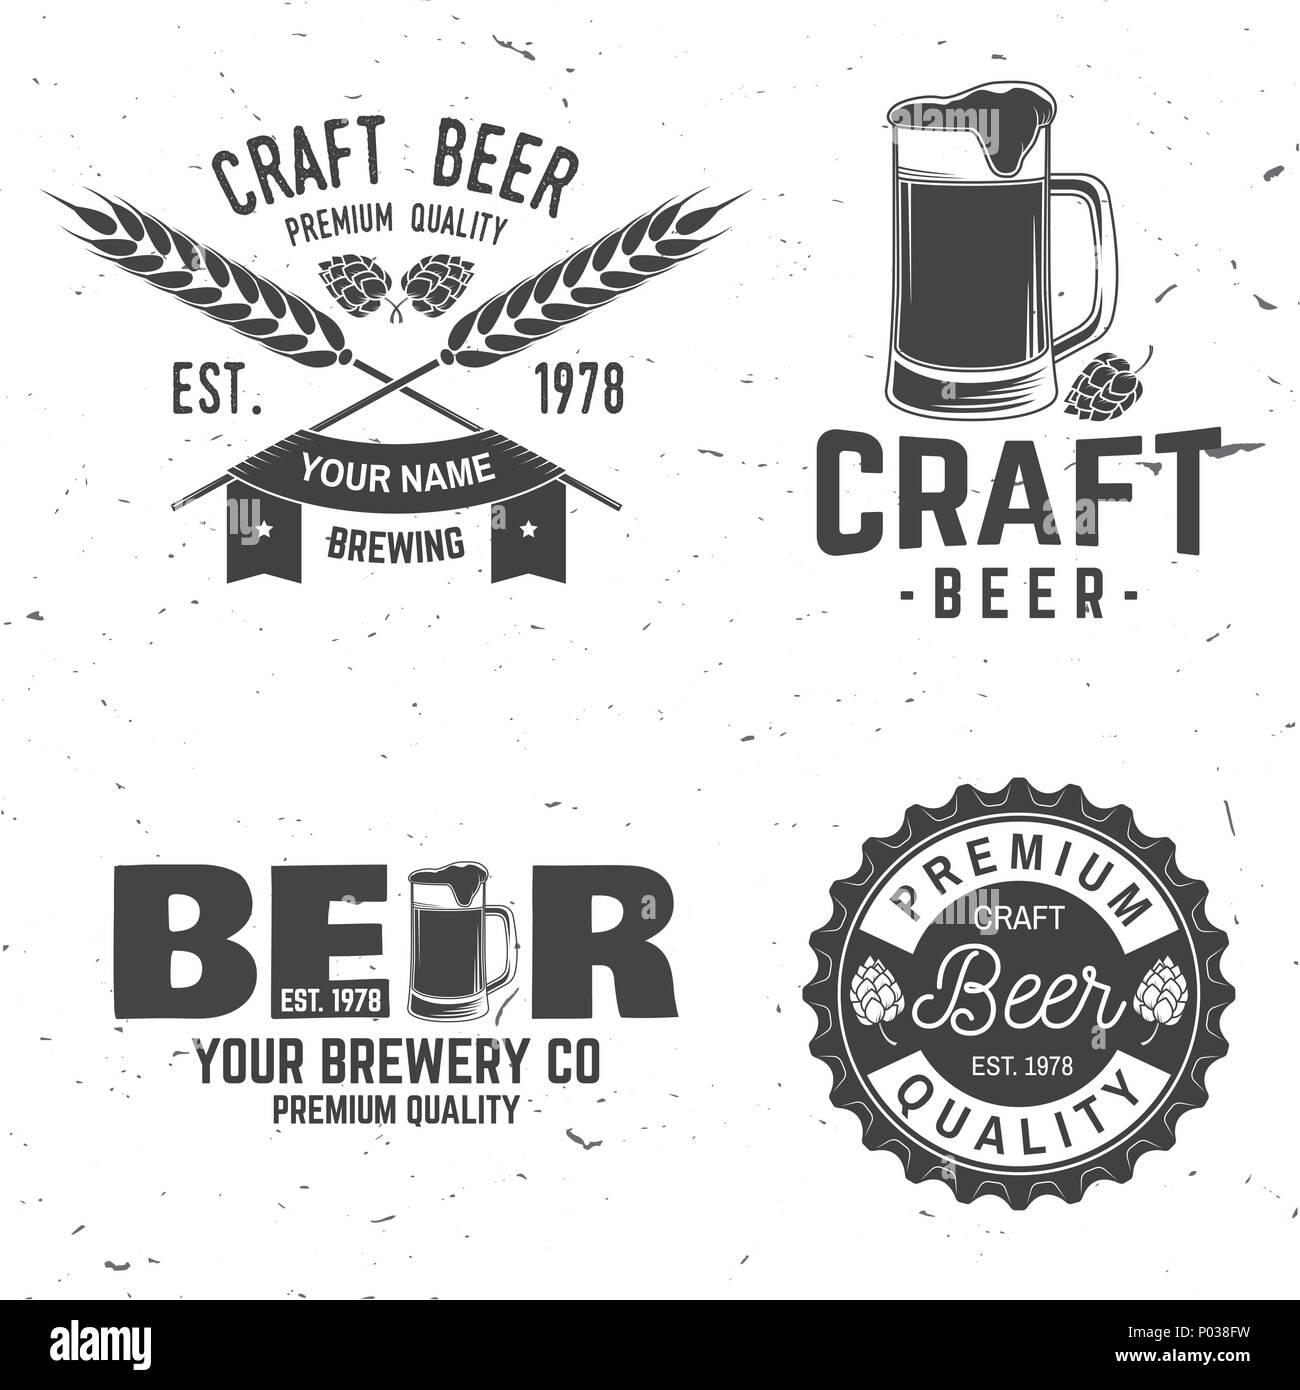 Set of Craft Beer badges with hops and bear. Vector illustration. Vintage design for bar, pub and restaurant business. Coaster for beer. - Stock Vector